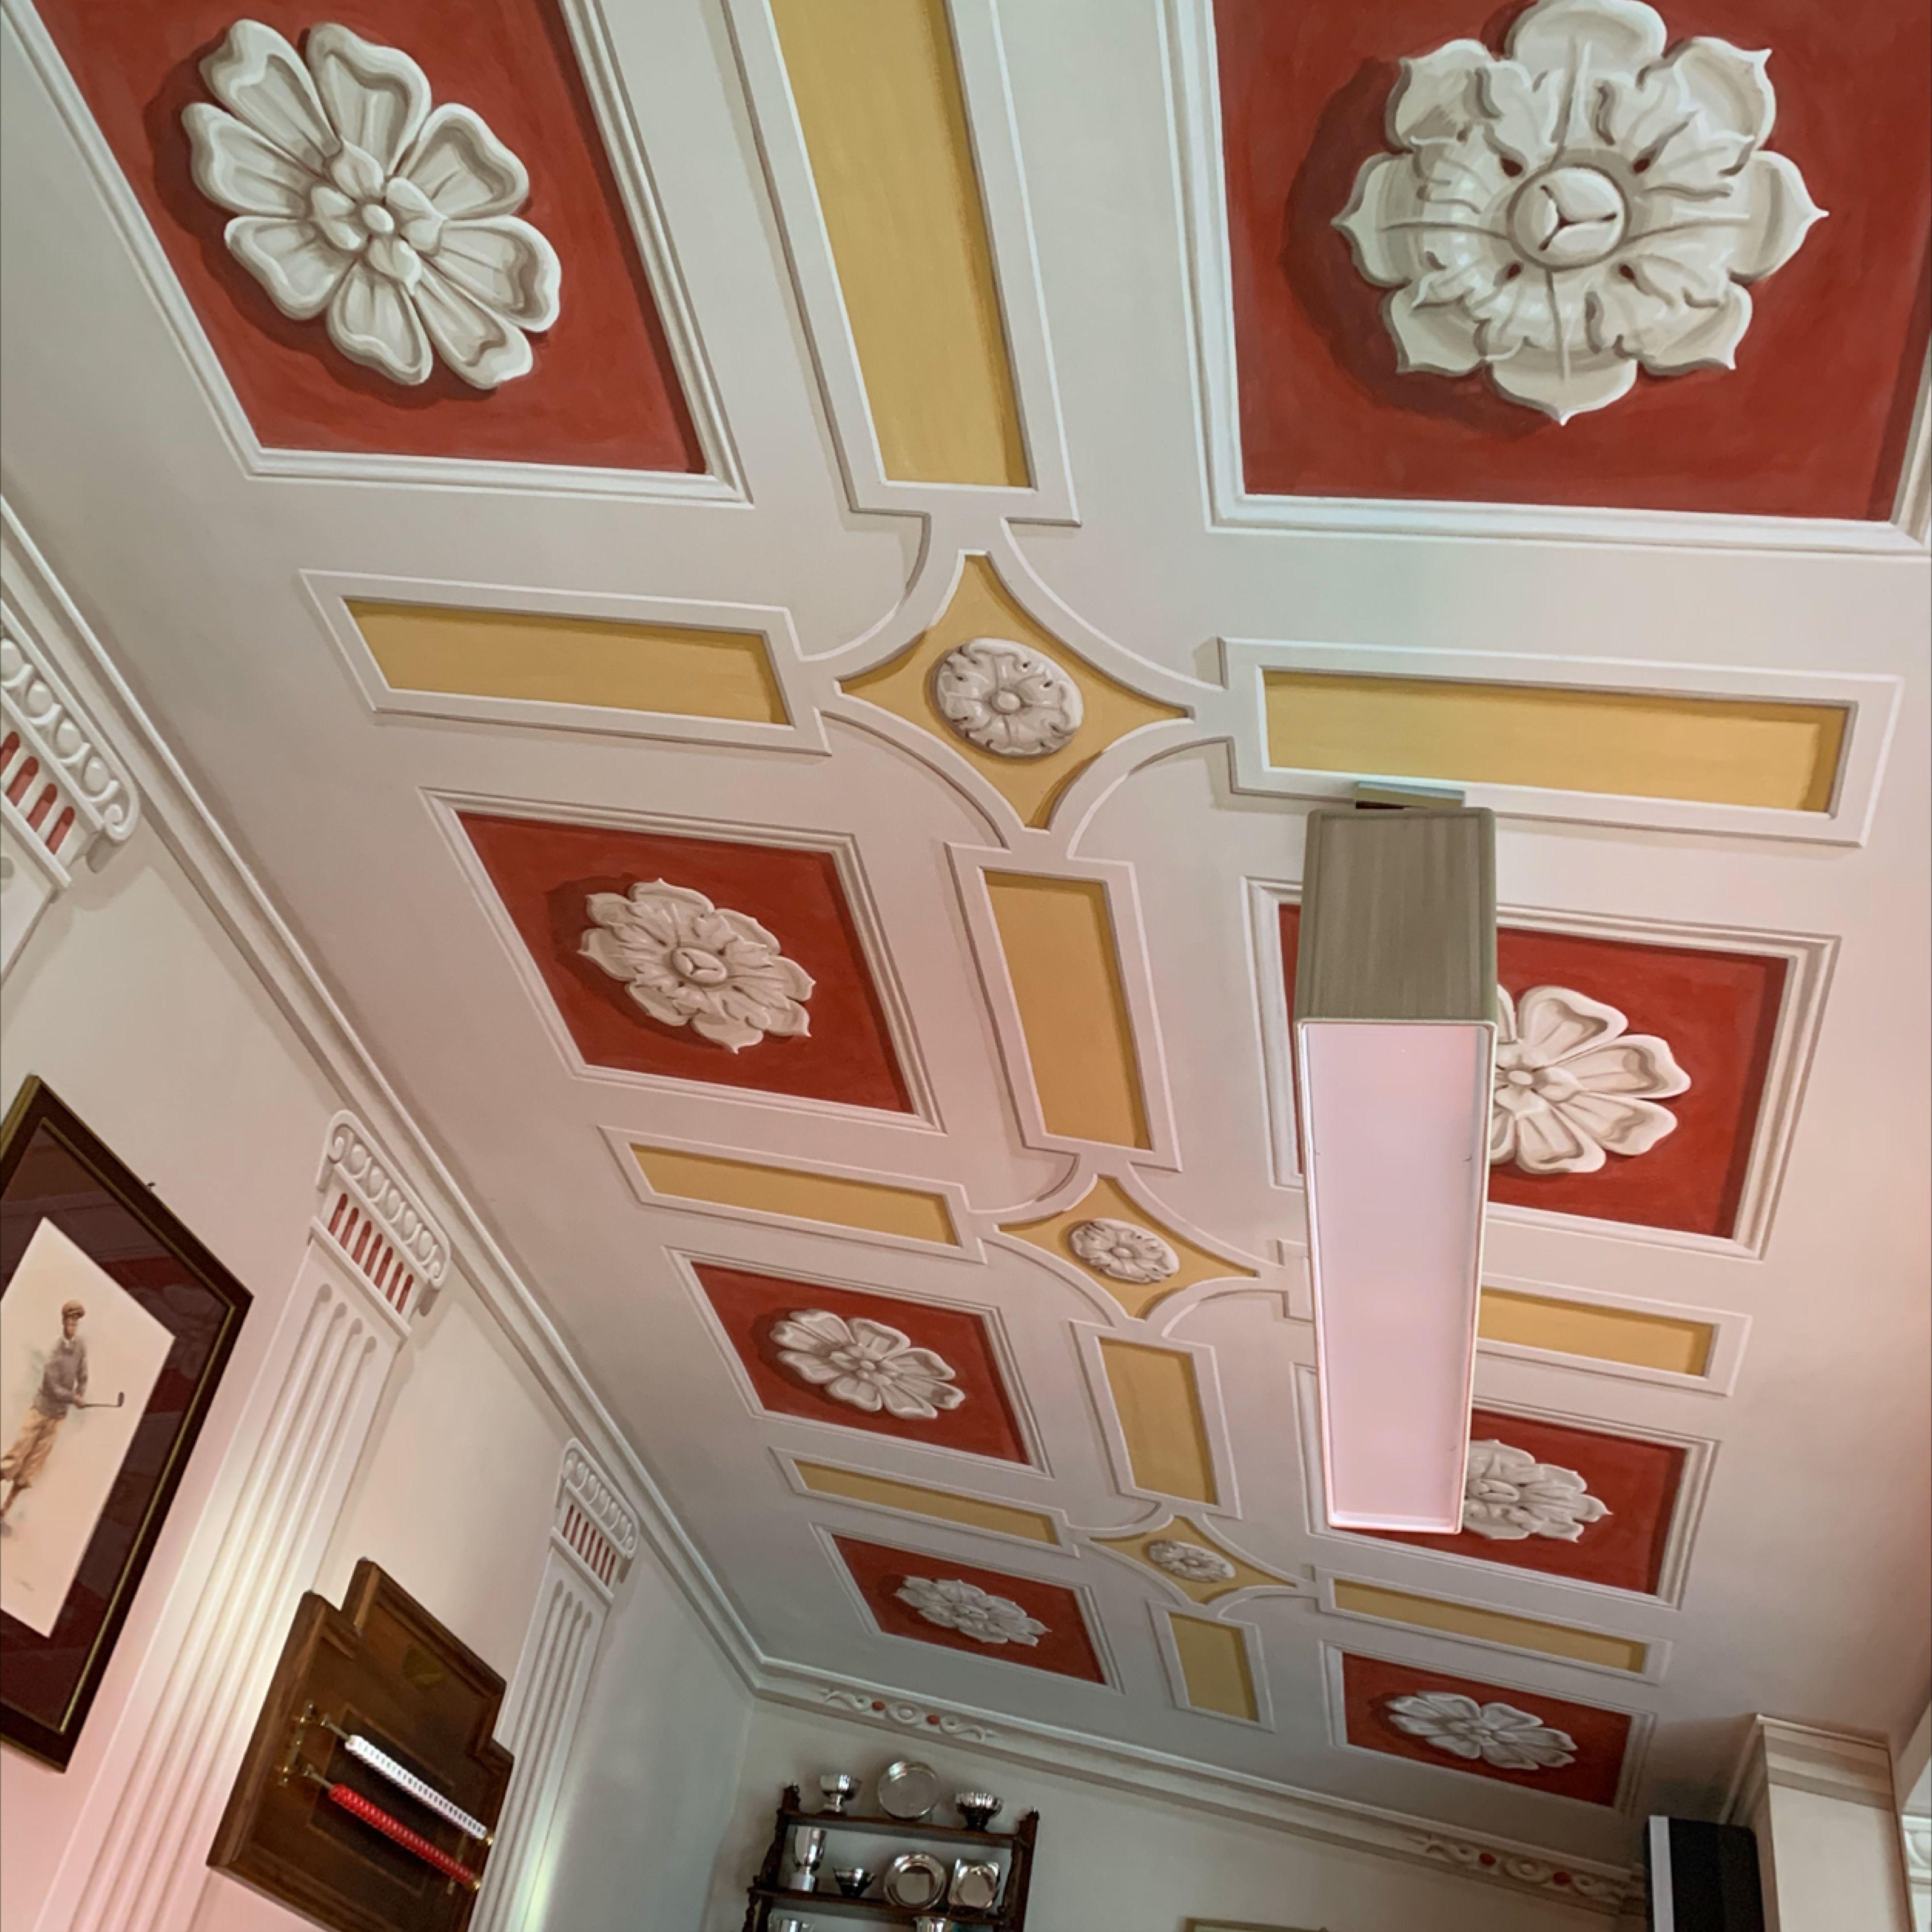 soffitto dipinto | Soffitto dipinto, Soffitto a cassettoni ...